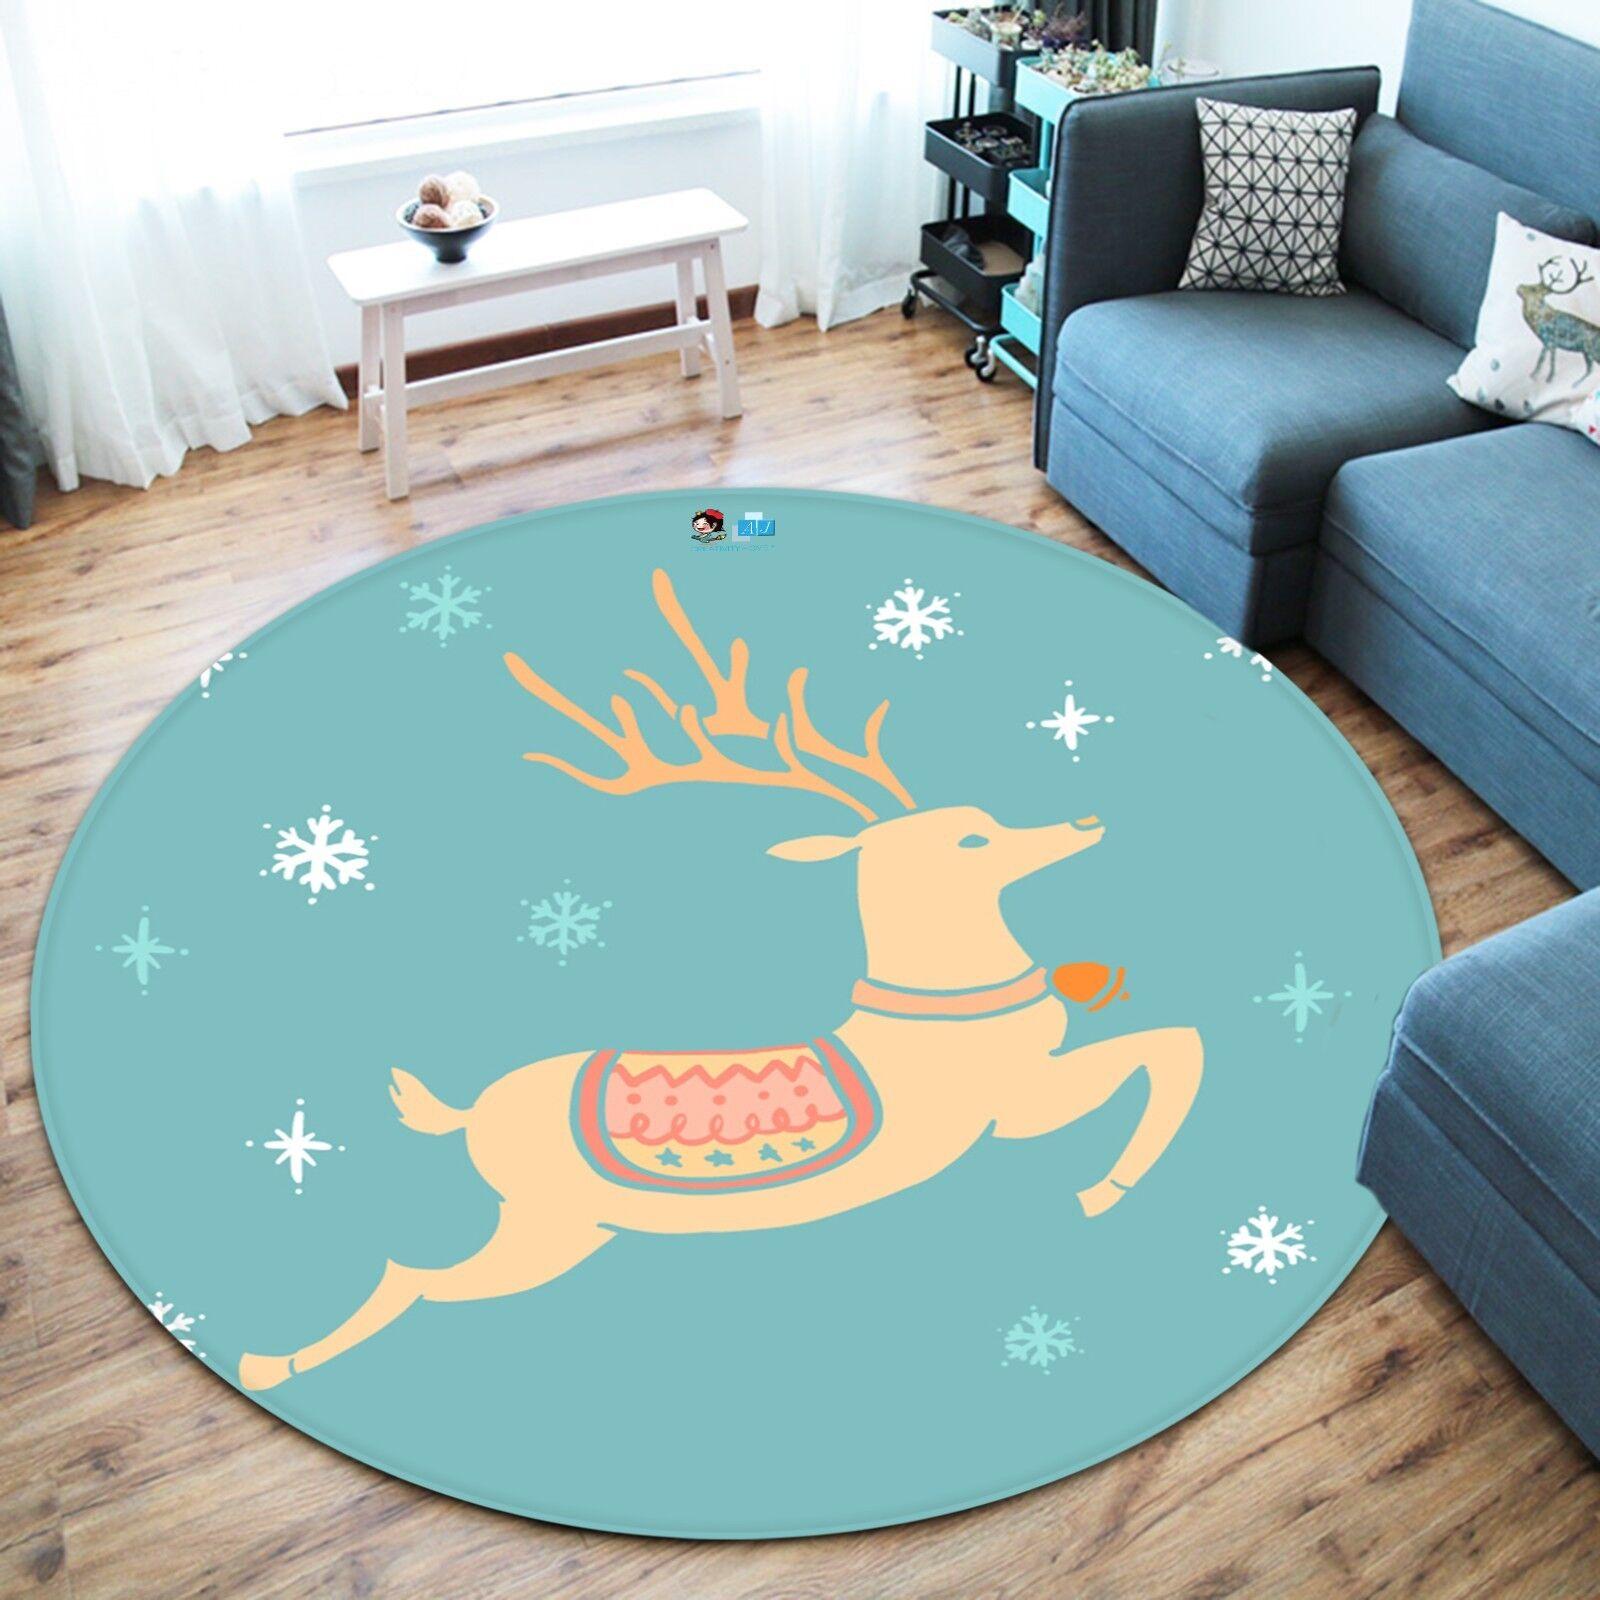 3d Natale Xmas 621 antiscivolo tappeto tappetino vano giri elegante TAPPETO de